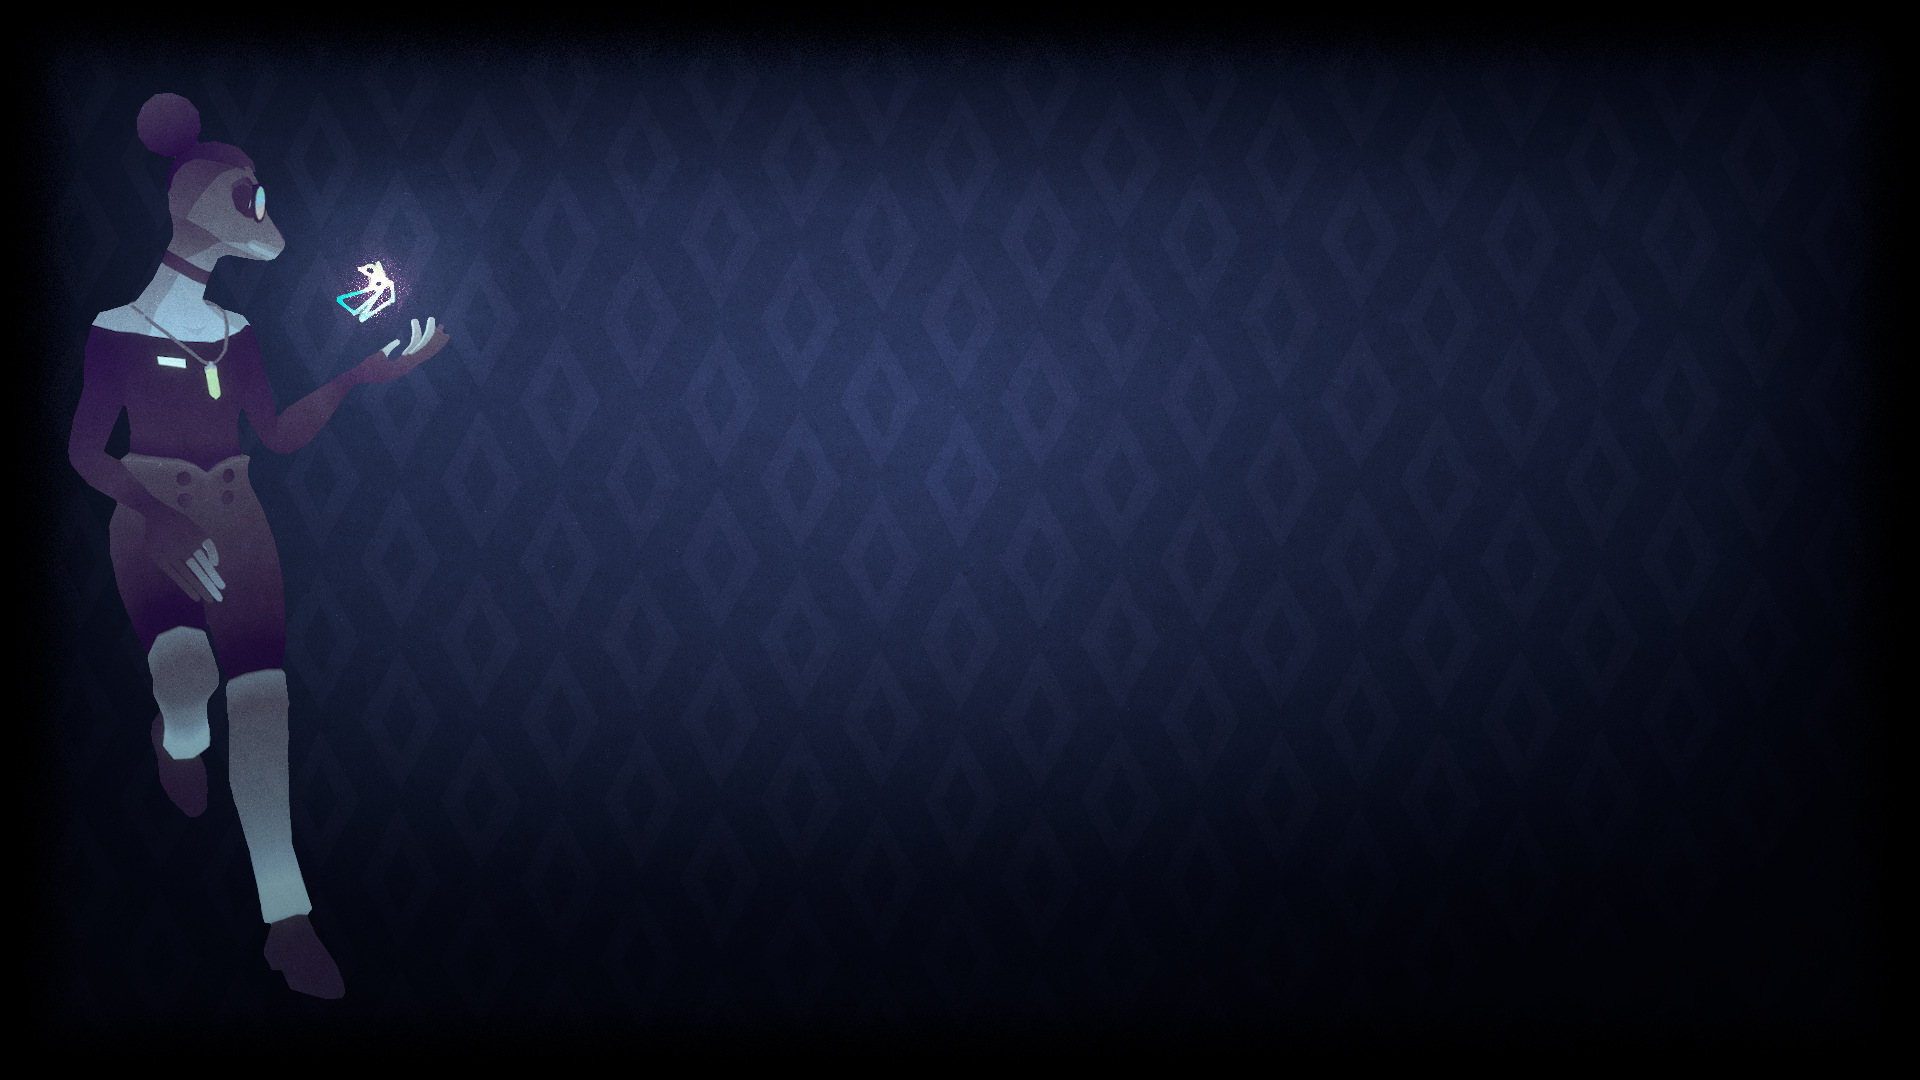 Depanneur Nocturne Appid 1285160 Steamdb